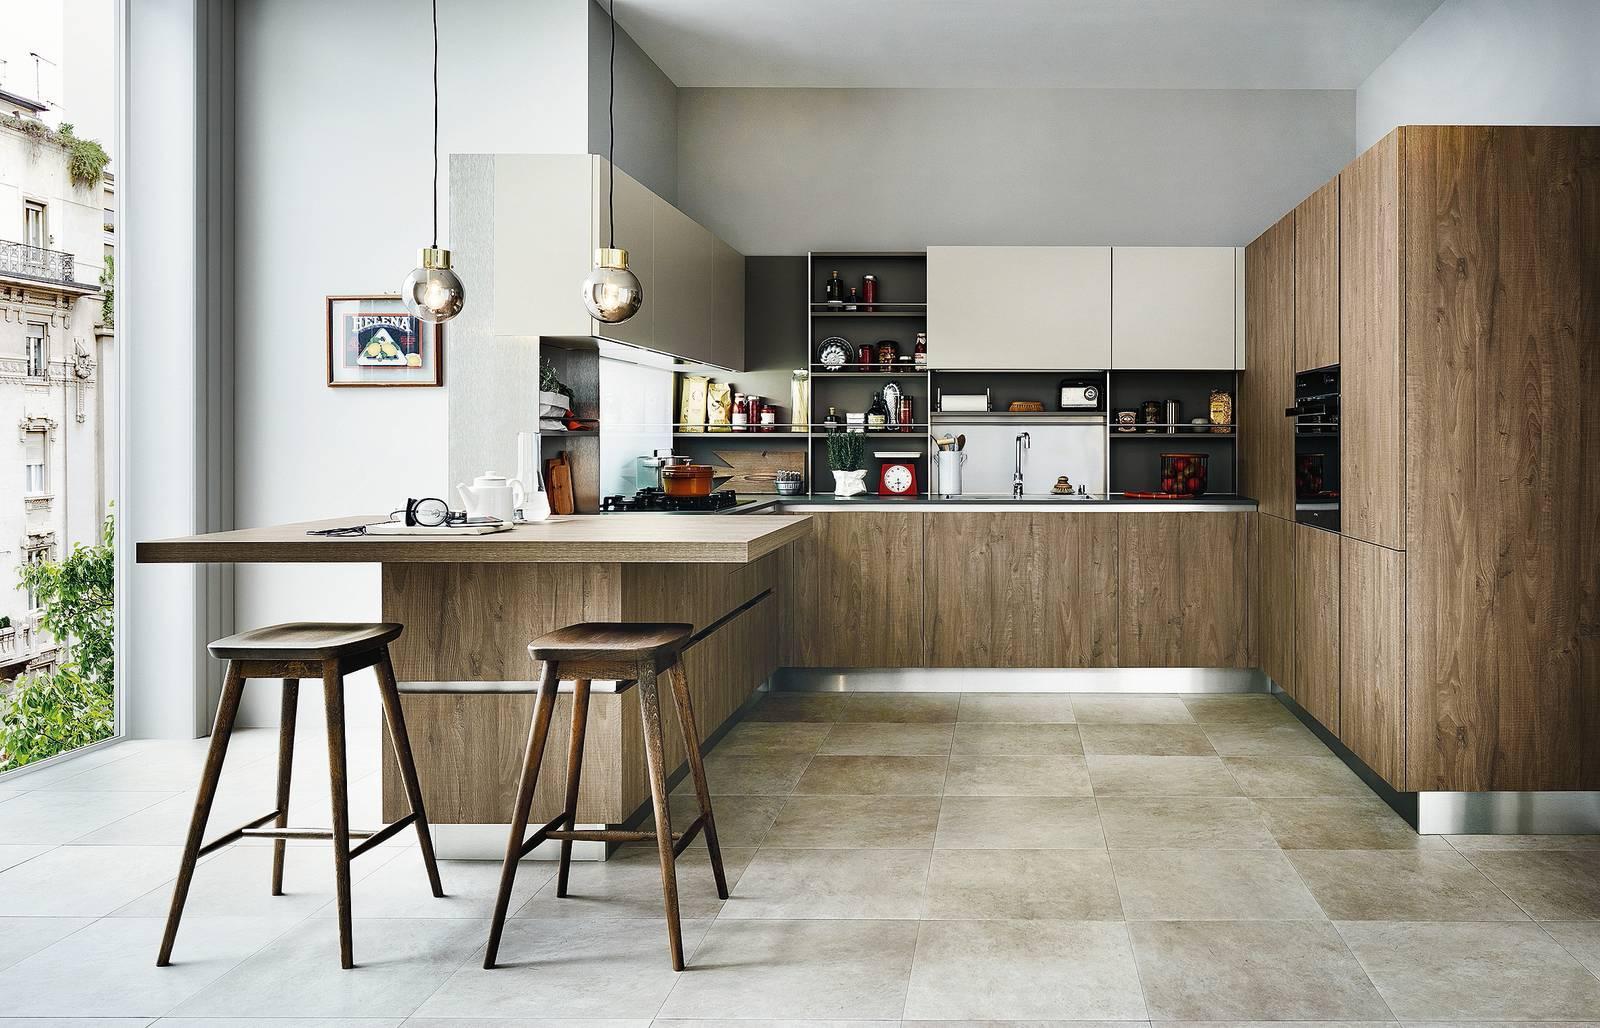 Cucina funzionale e pratica non solo bella cose di casa for Cucine arredate